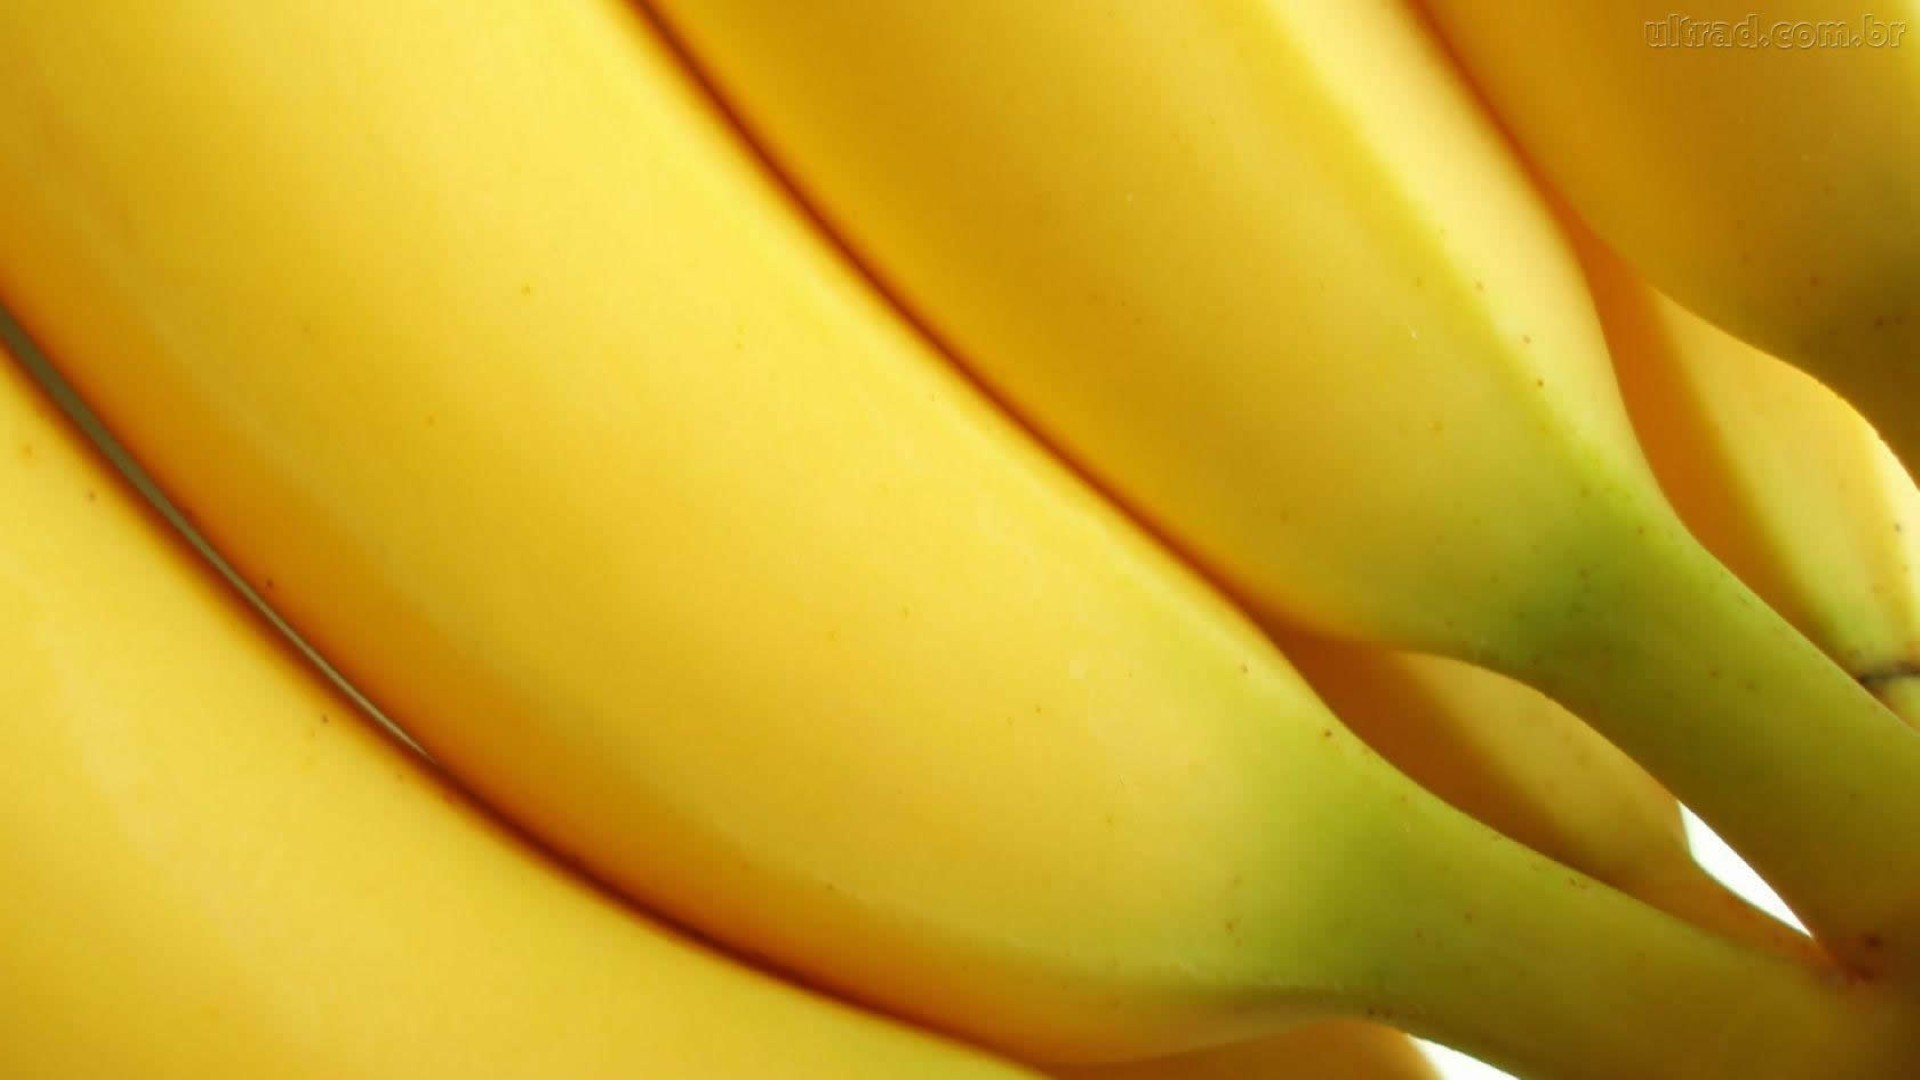 Banana Full HD Wallpaper